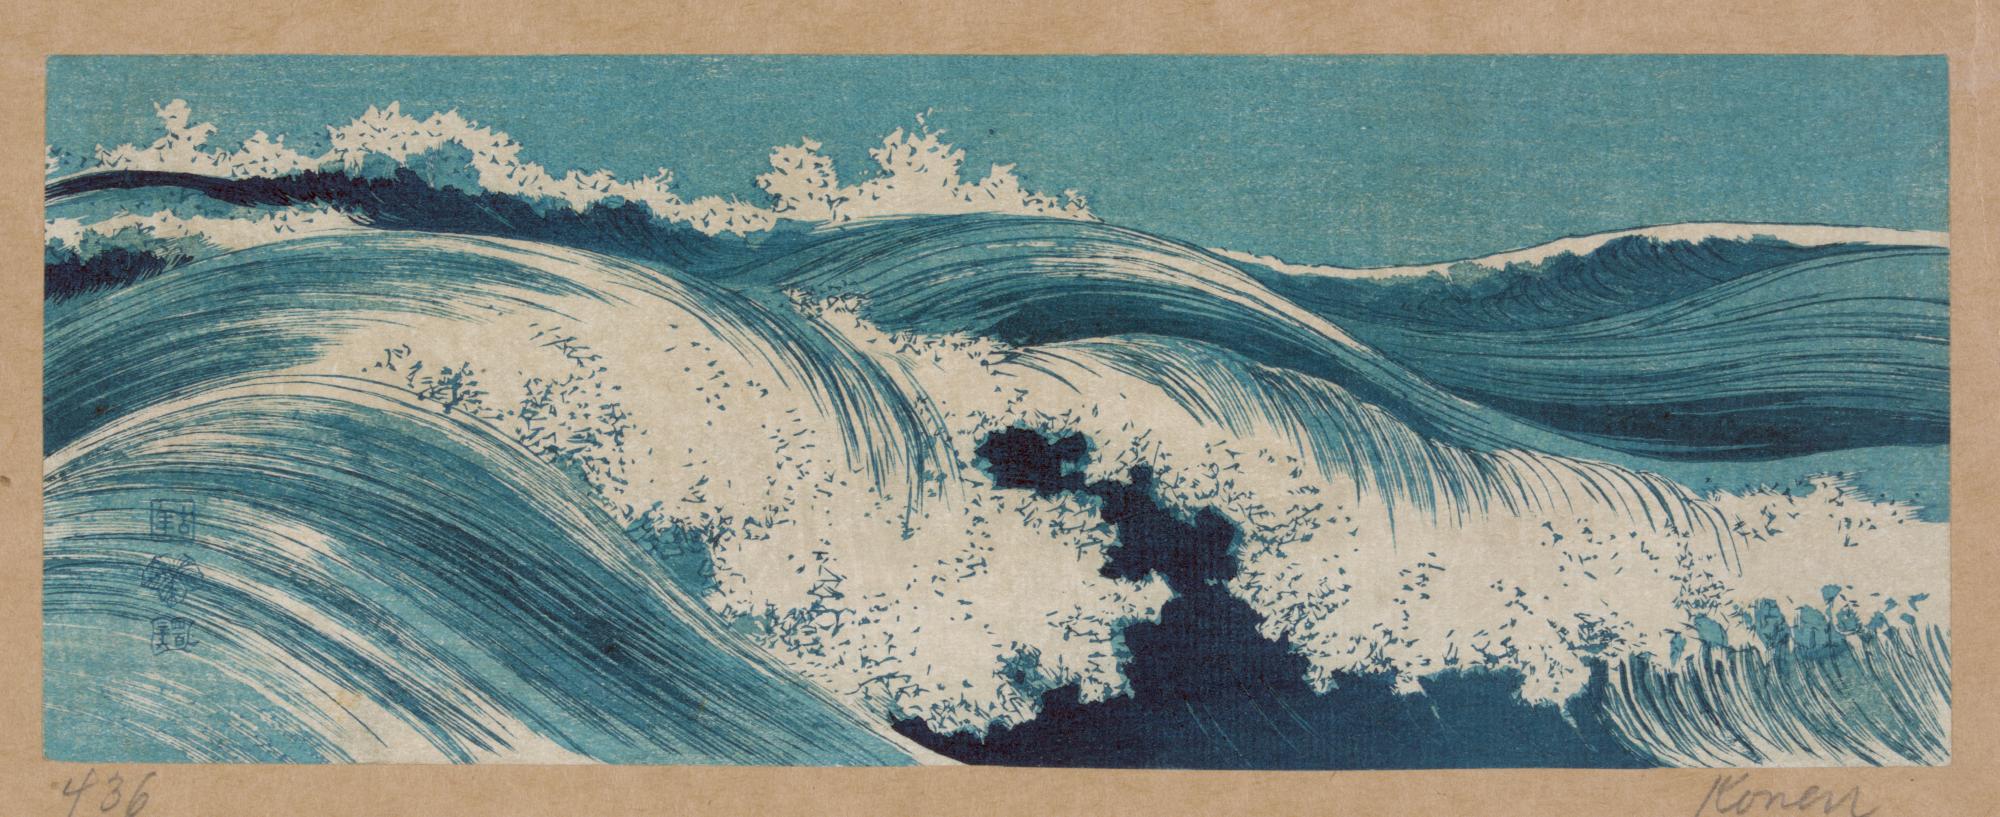 High waves image